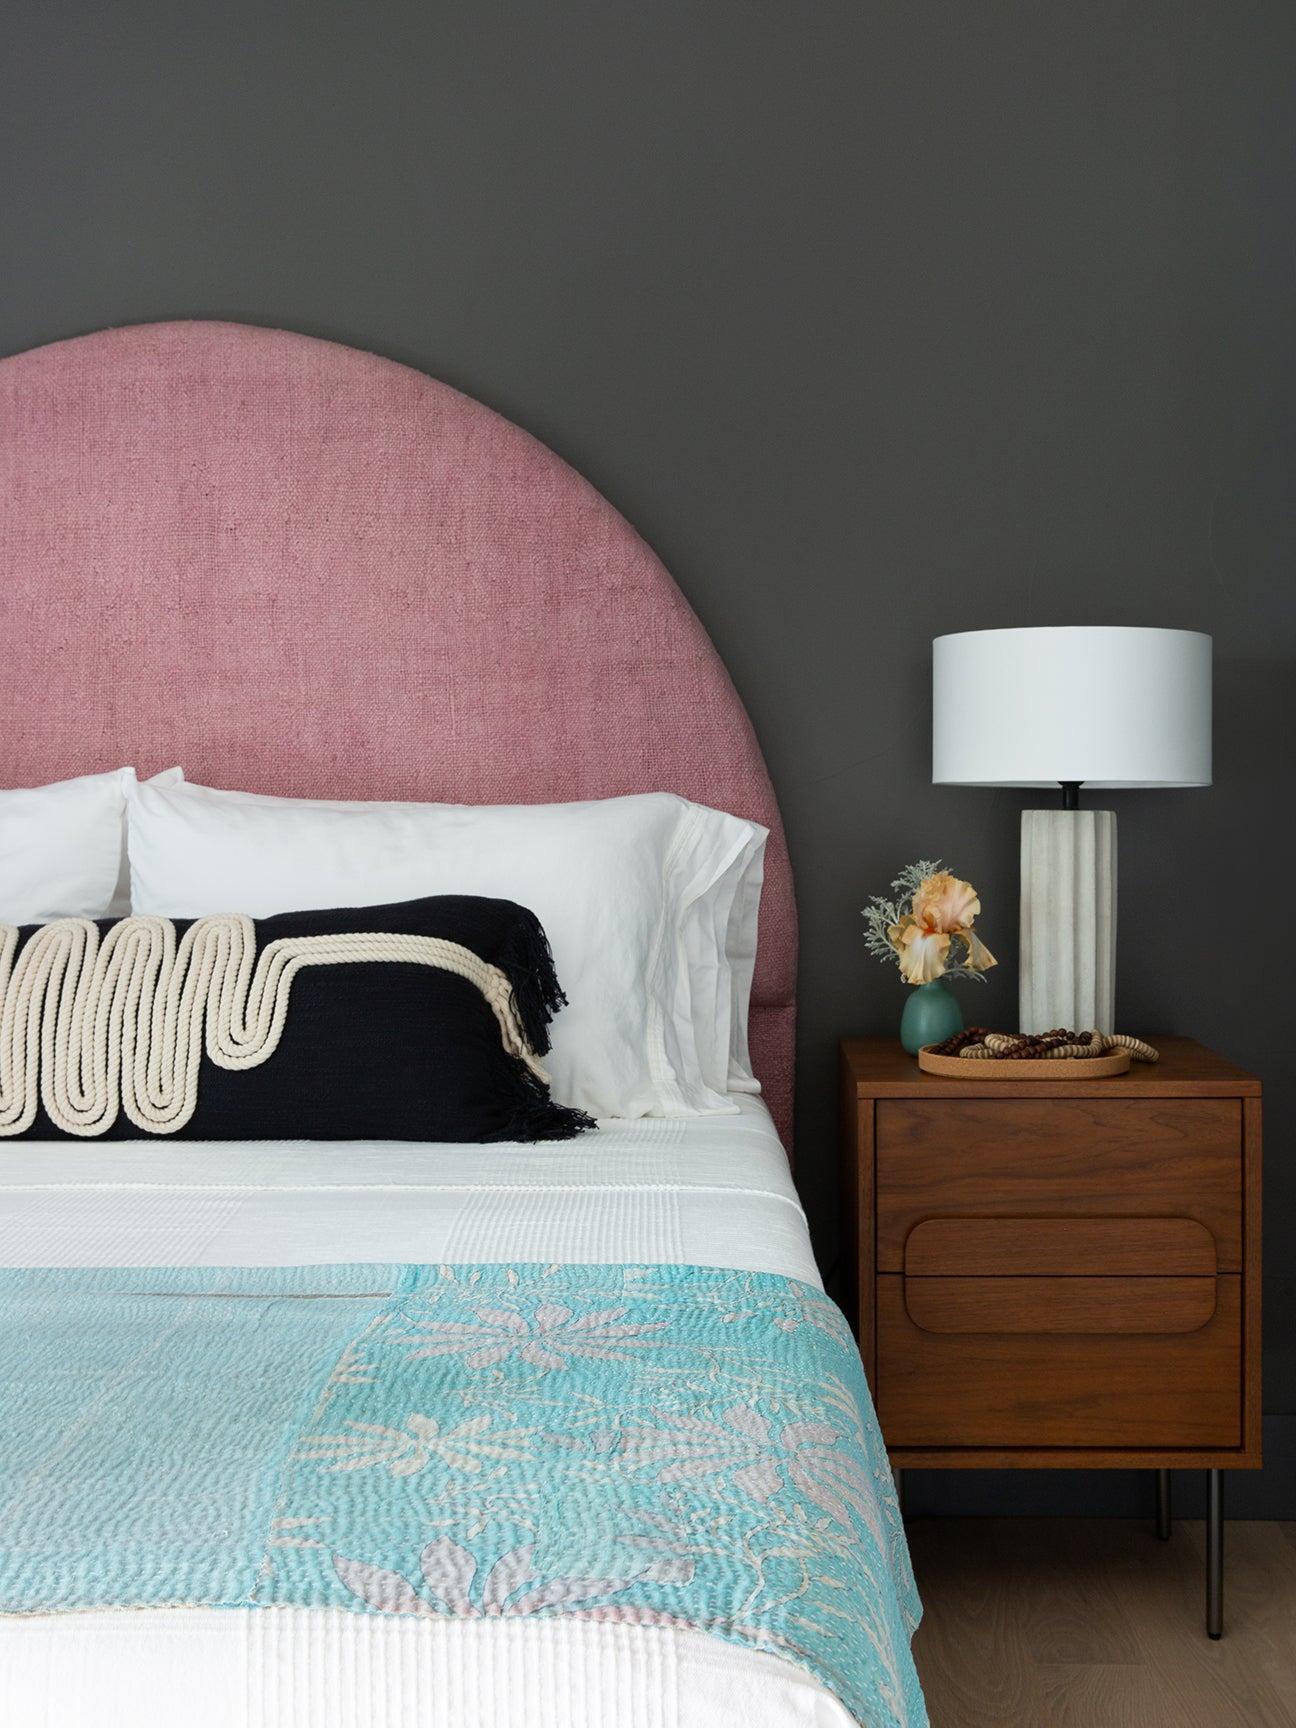 Dark gray bedroom with pink headboard.